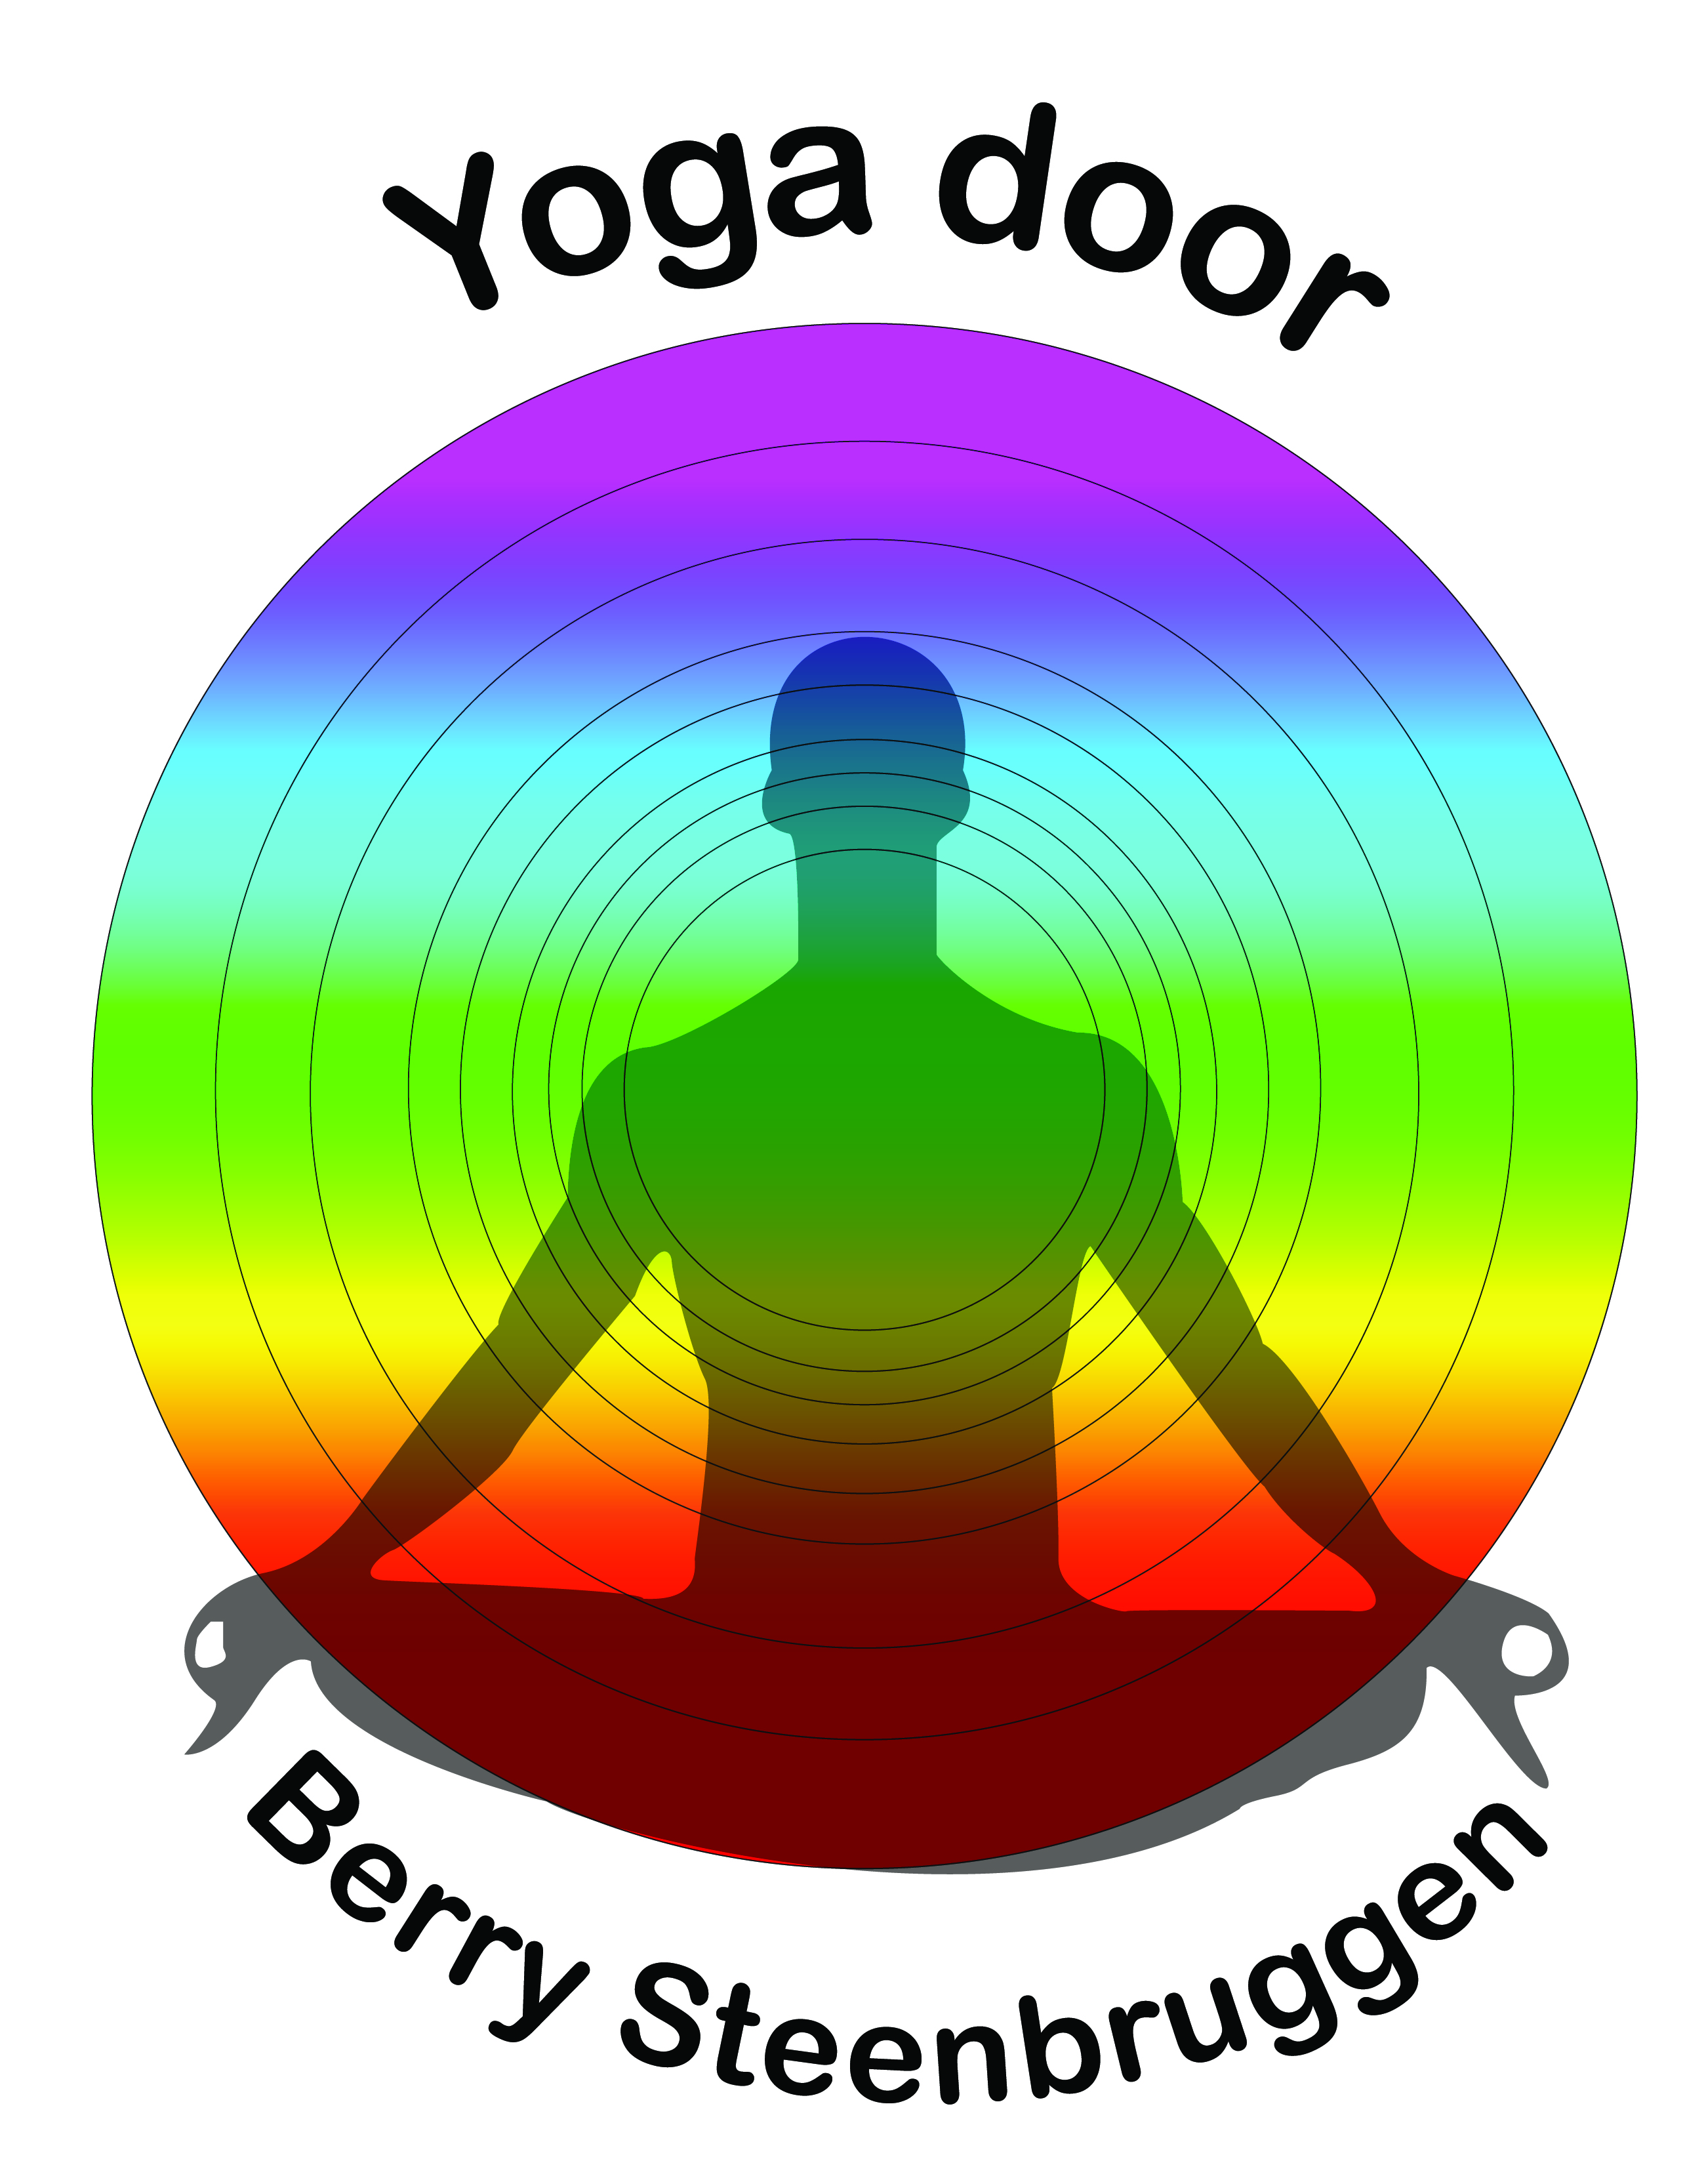 Deventer en yoga